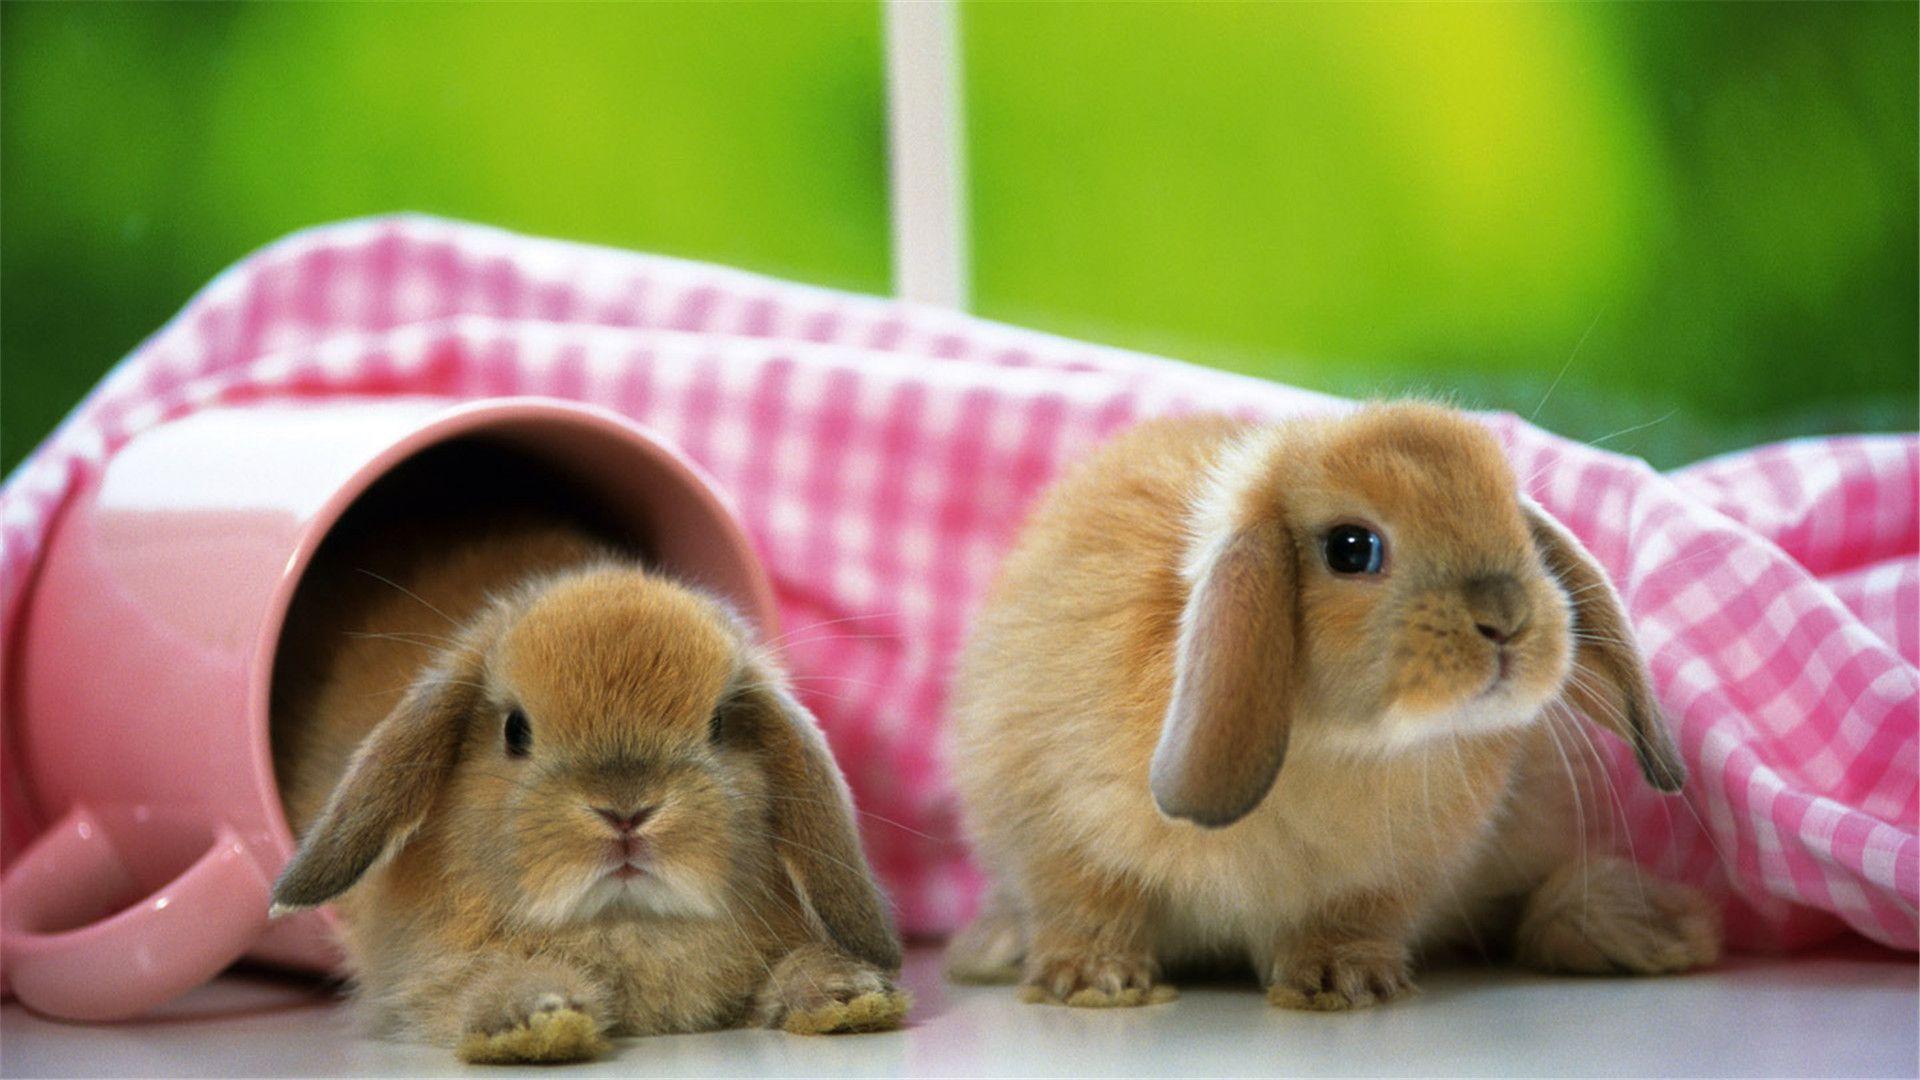 Cute Animals Rabbits